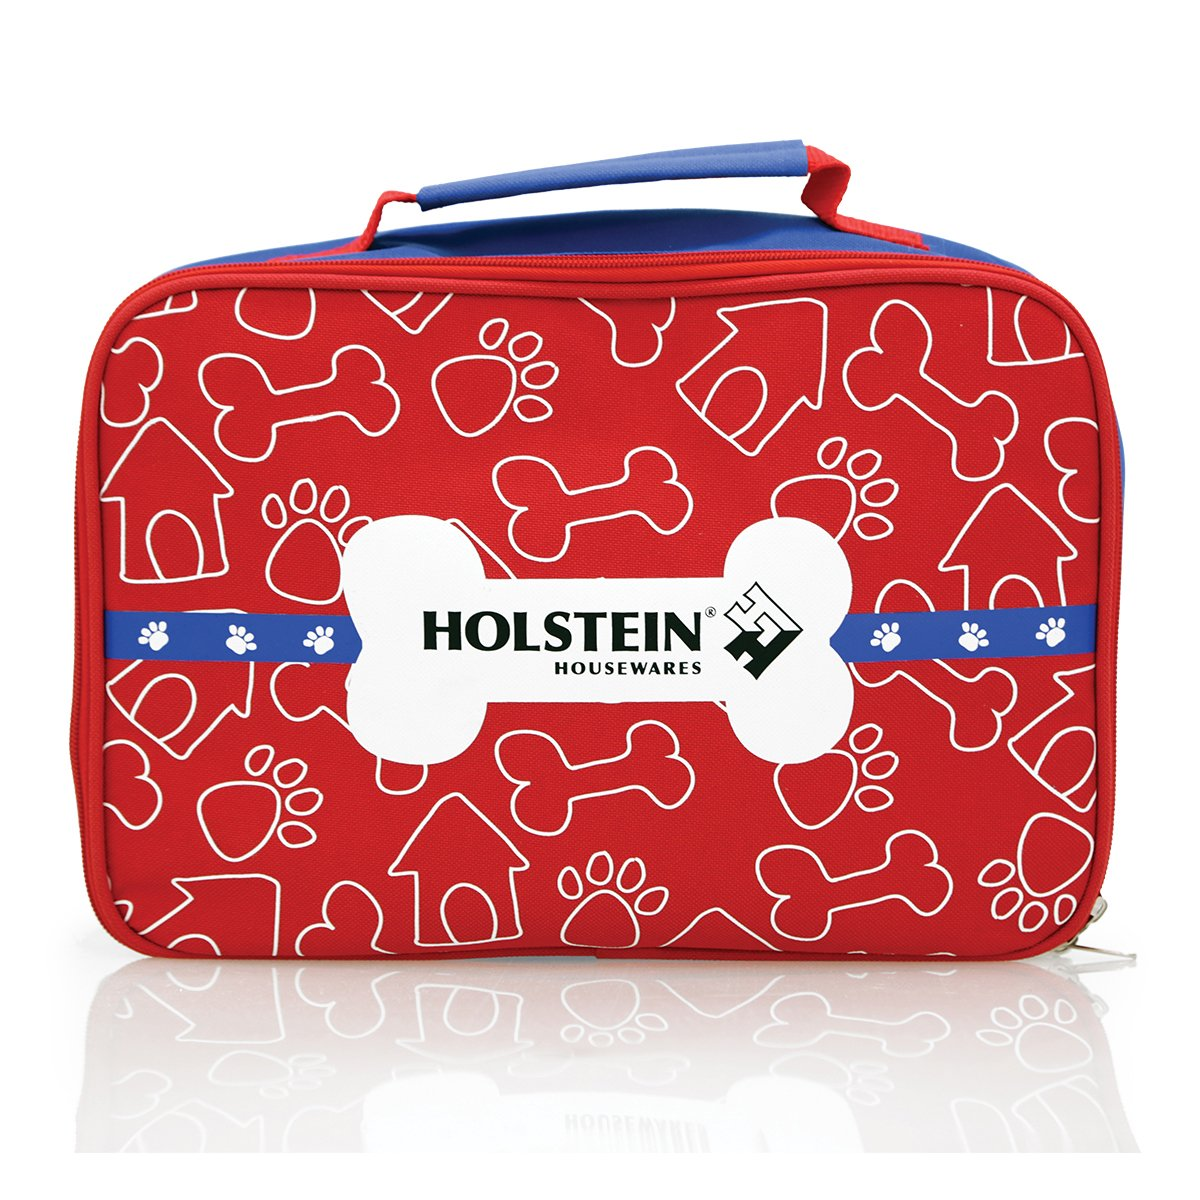 Holstein Housewares HF-09024R-BU Pet Treat Maker Bundle - Red by Holstein Housewares (Image #3)